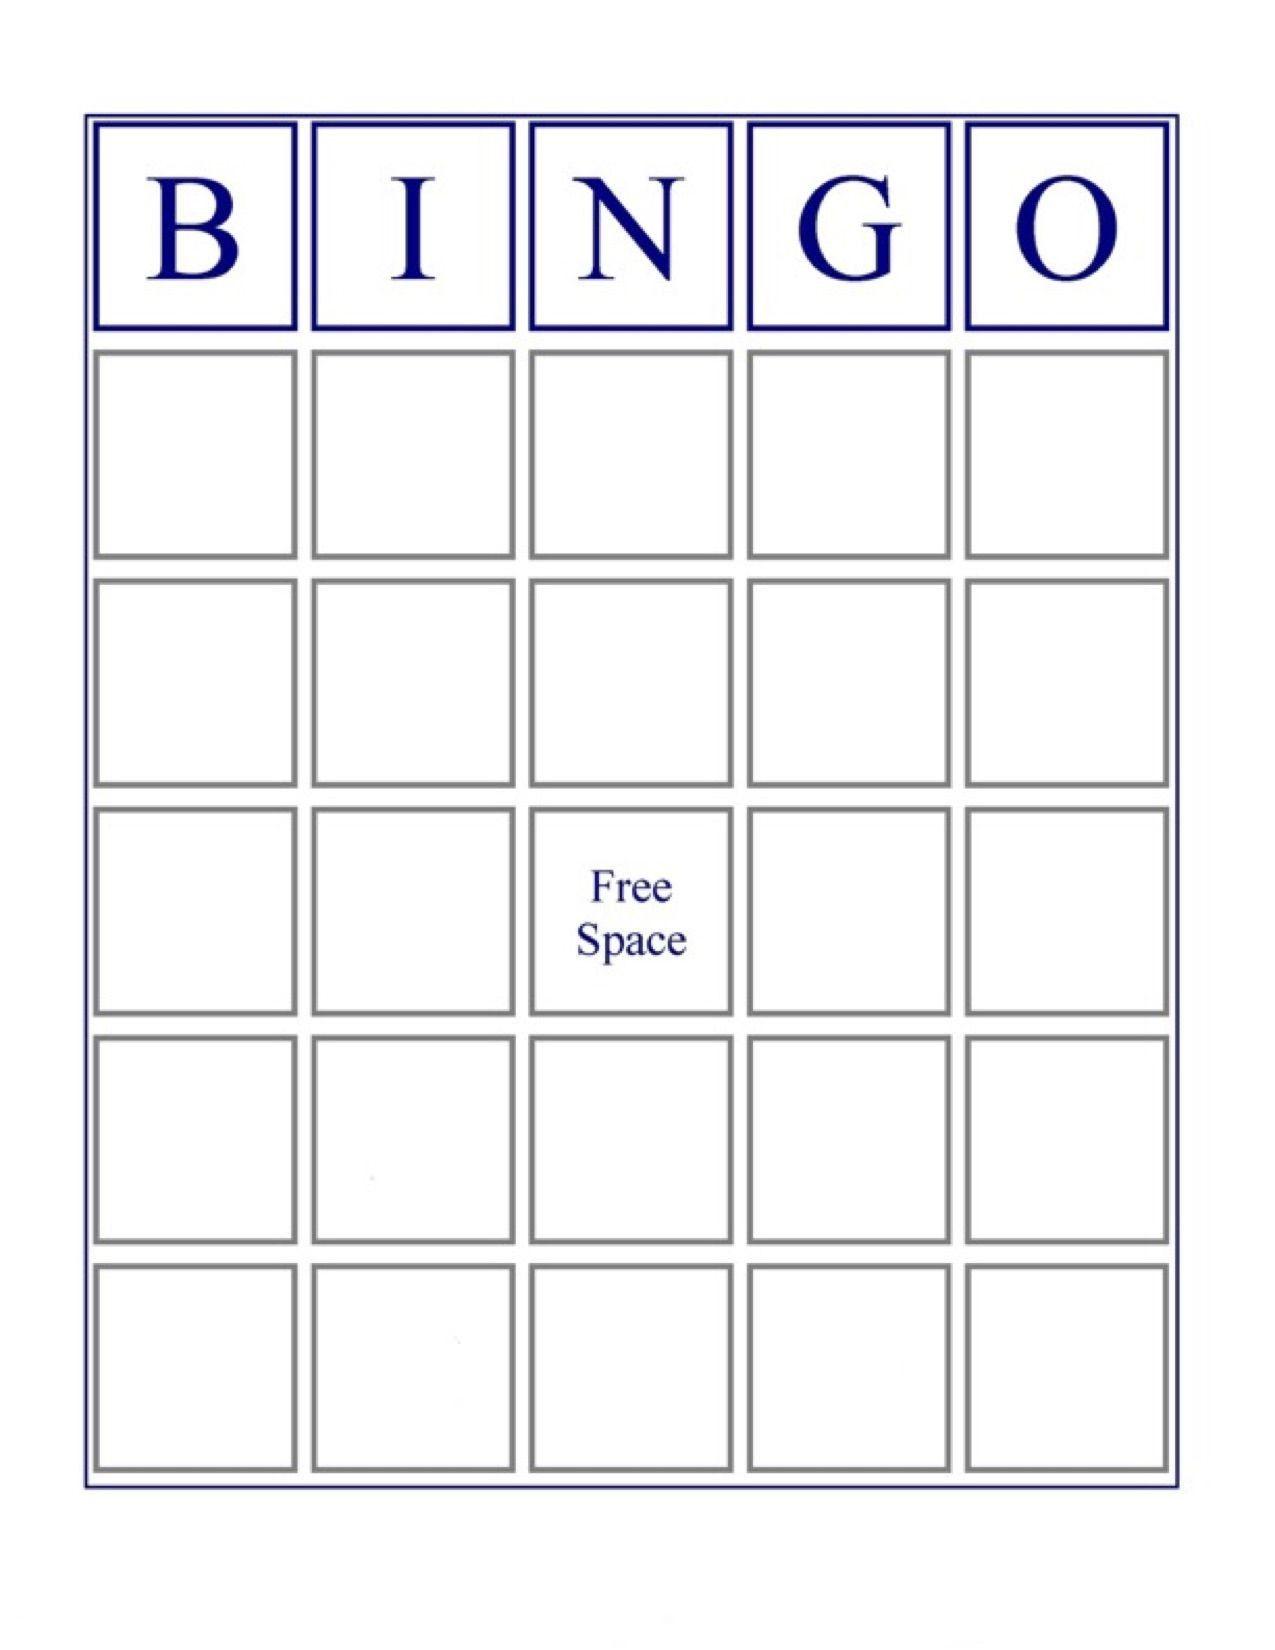 The Excellent Blank Bingo Card Inspirational Pin On Sinif Esyalari Pertaining To Bingo Car In 2020 Bingo Cards Printable Bingo Card Template Free Printable Bingo Cards